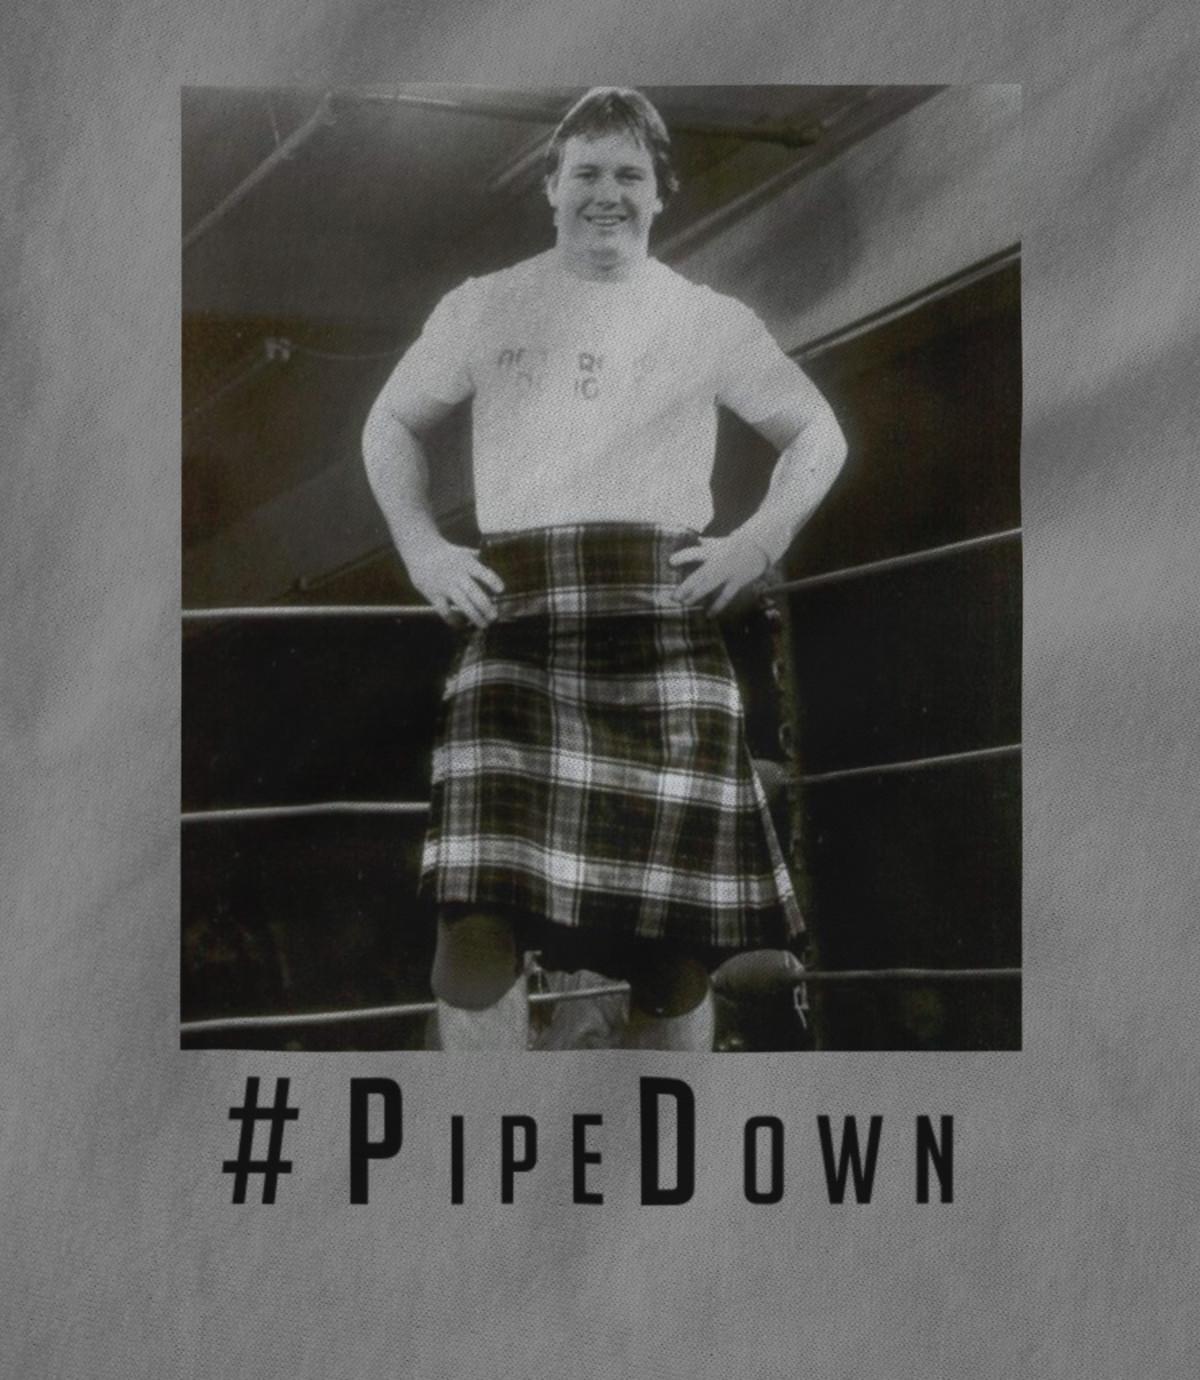 Pipe down   roddy piper hogtown classics 1480523769